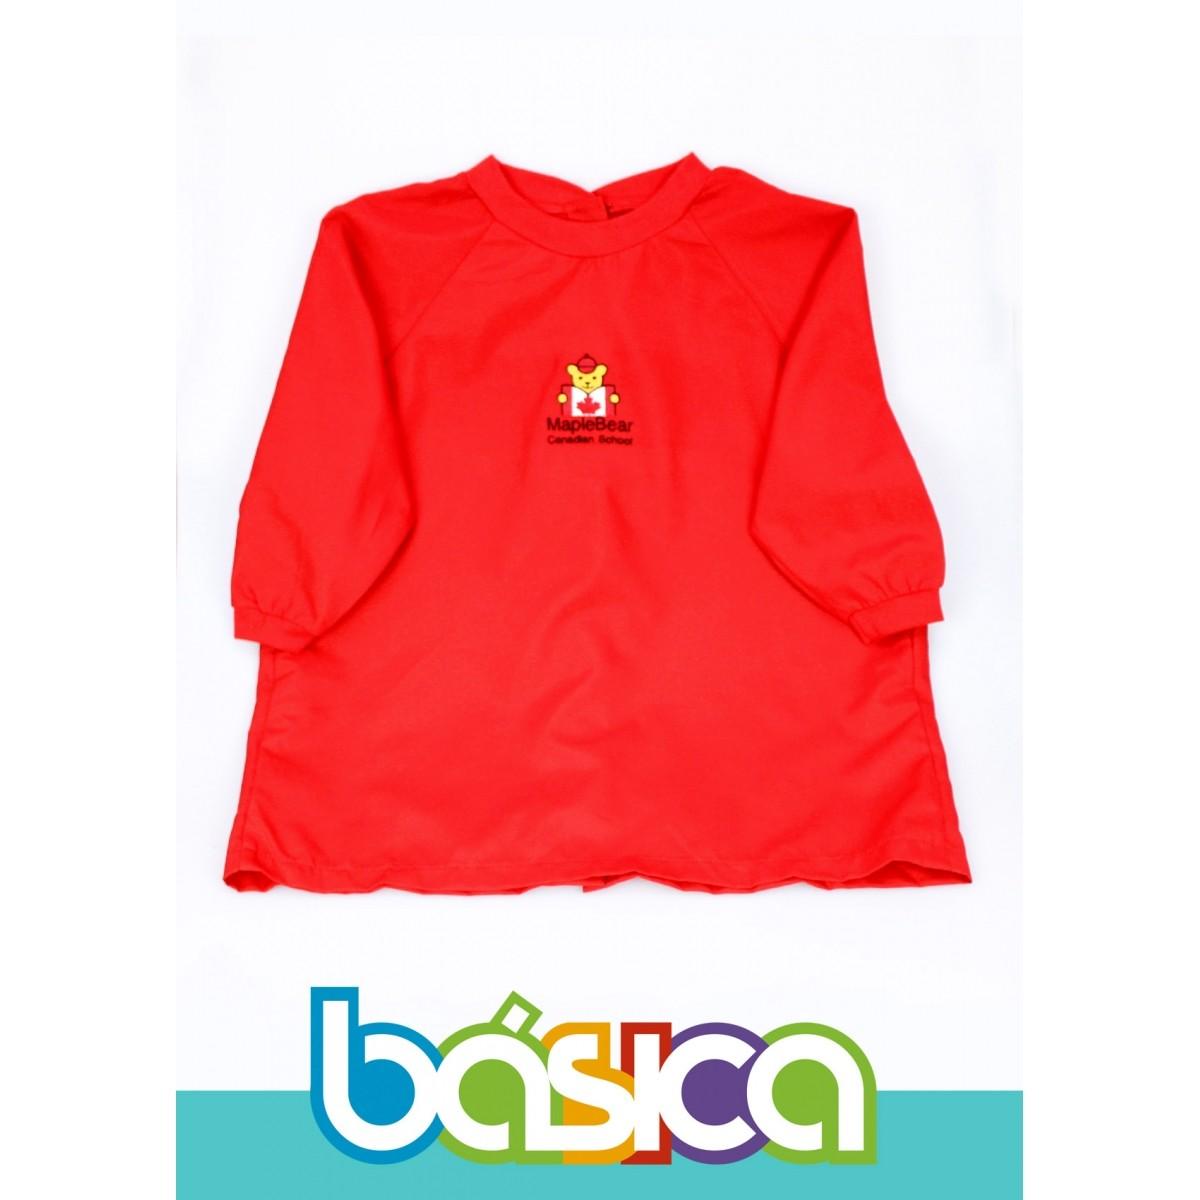 3c94a47b27 Avental Uniforme Maple Bear Infantil - BÁSICA UNIFORMES